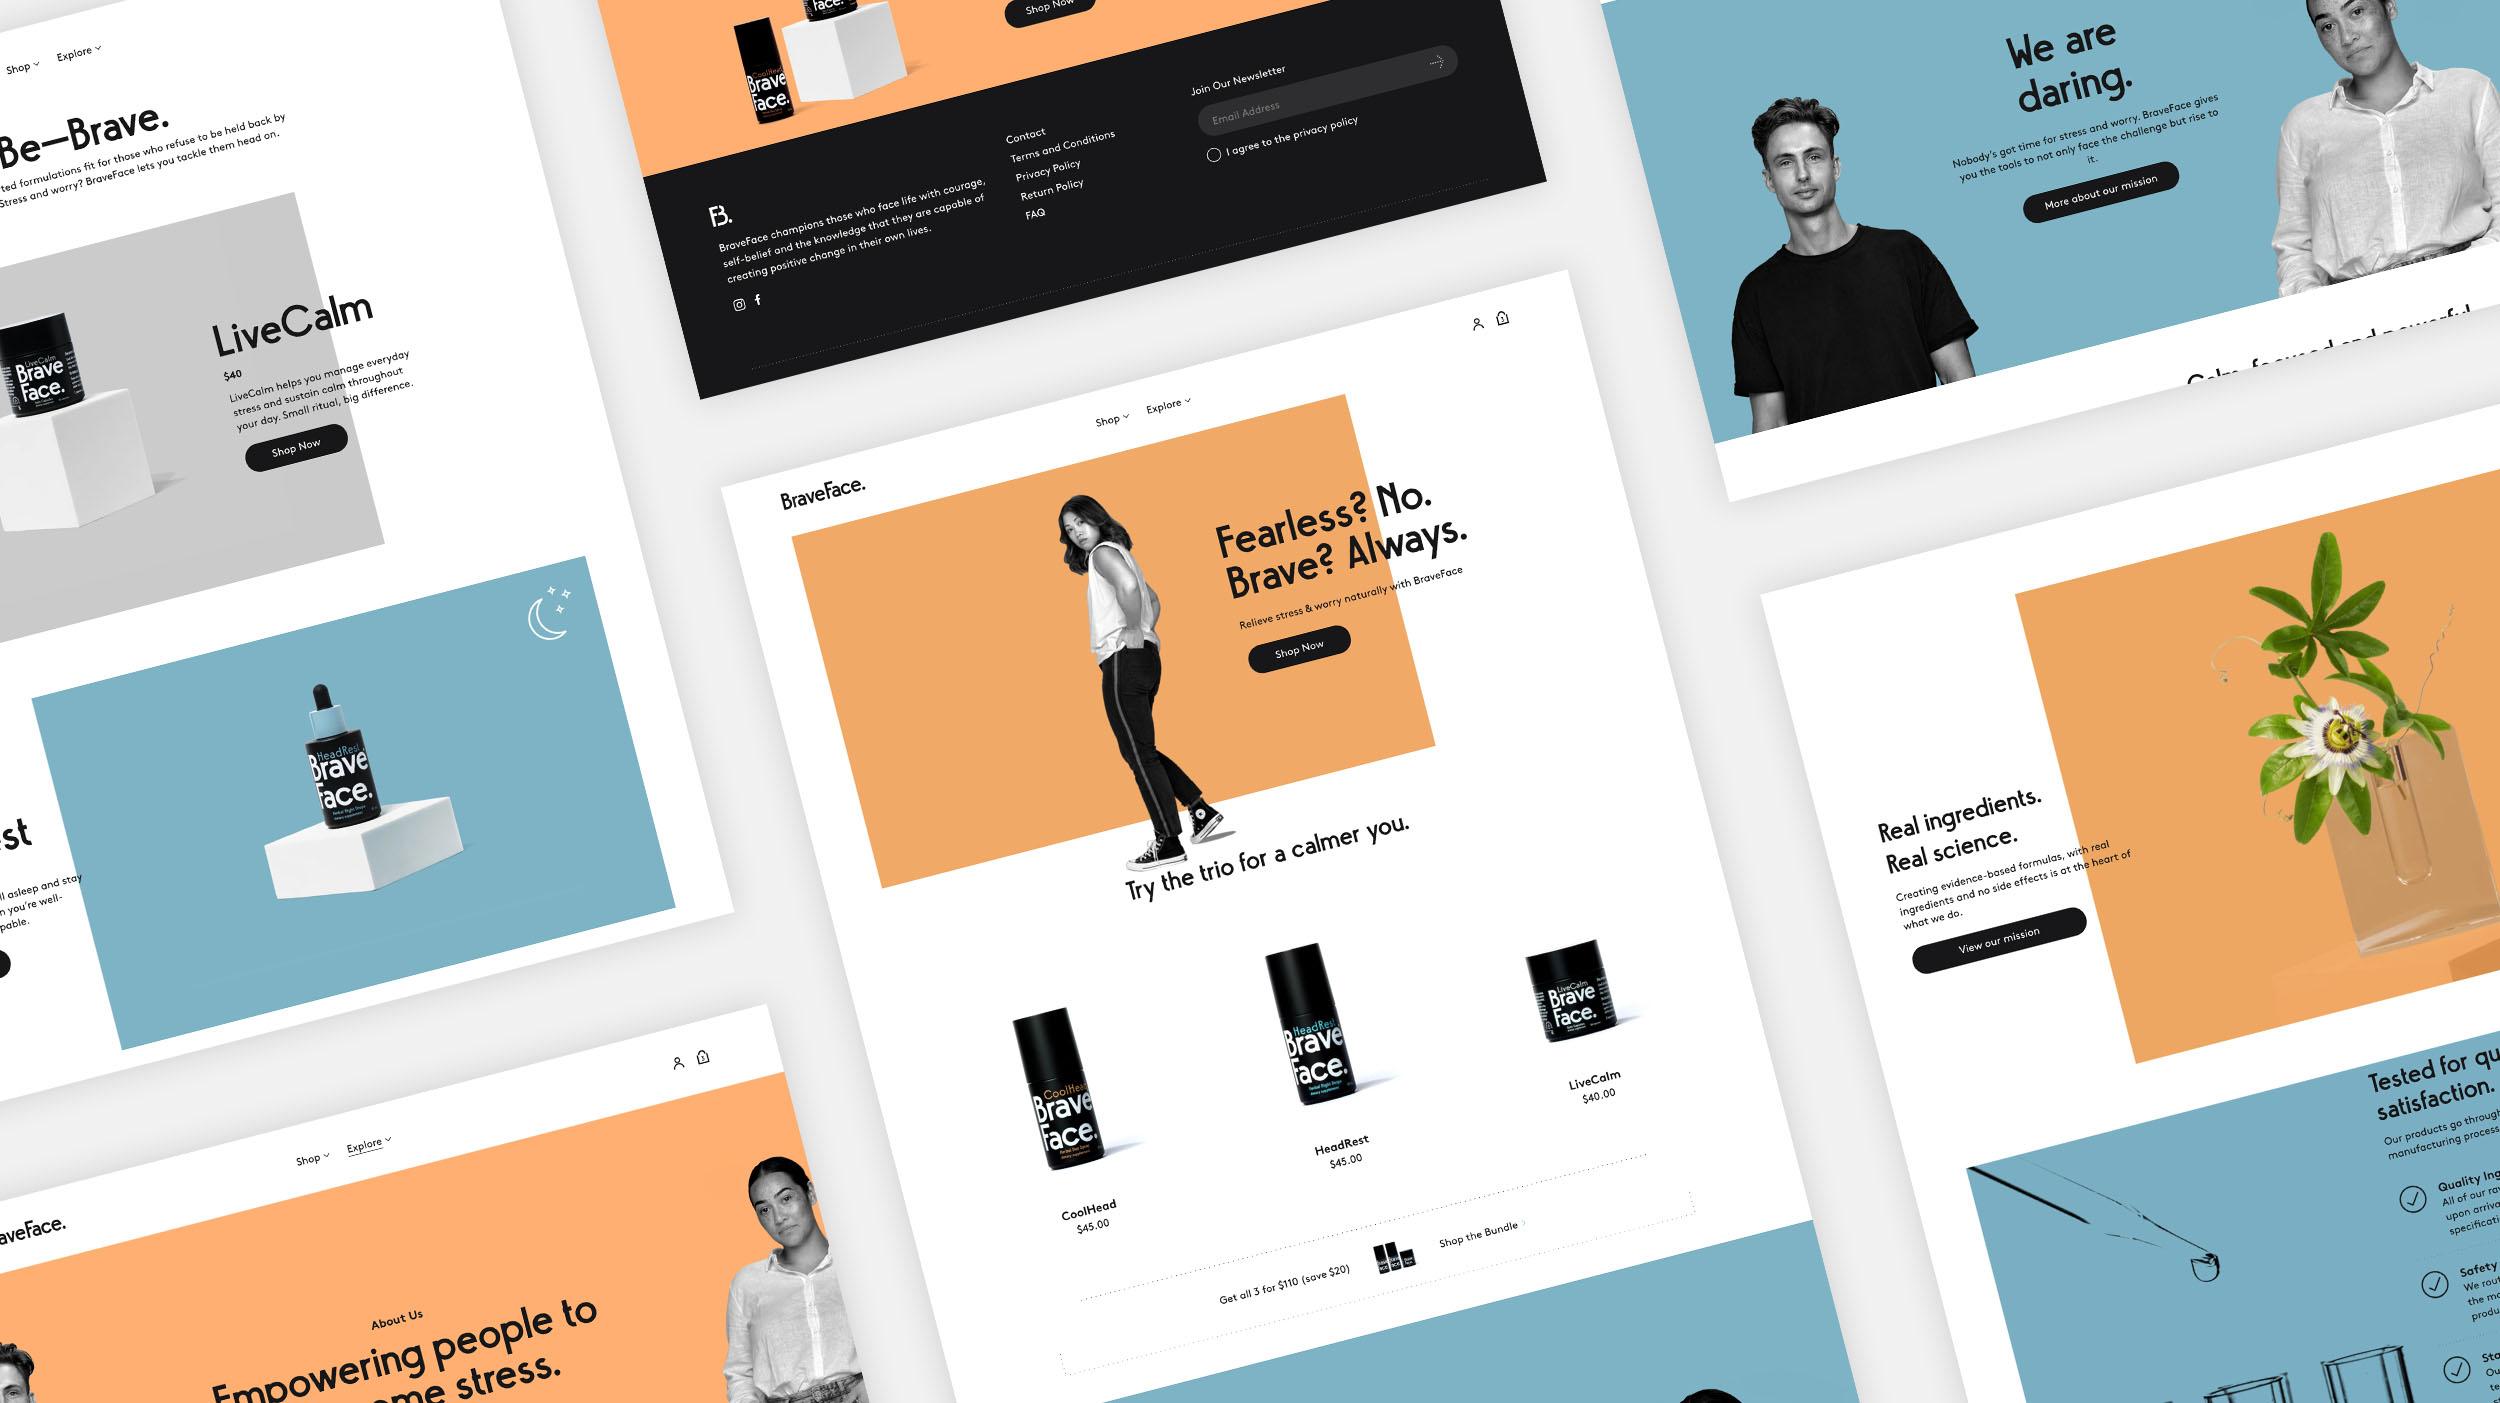 BraveFace desktop designs